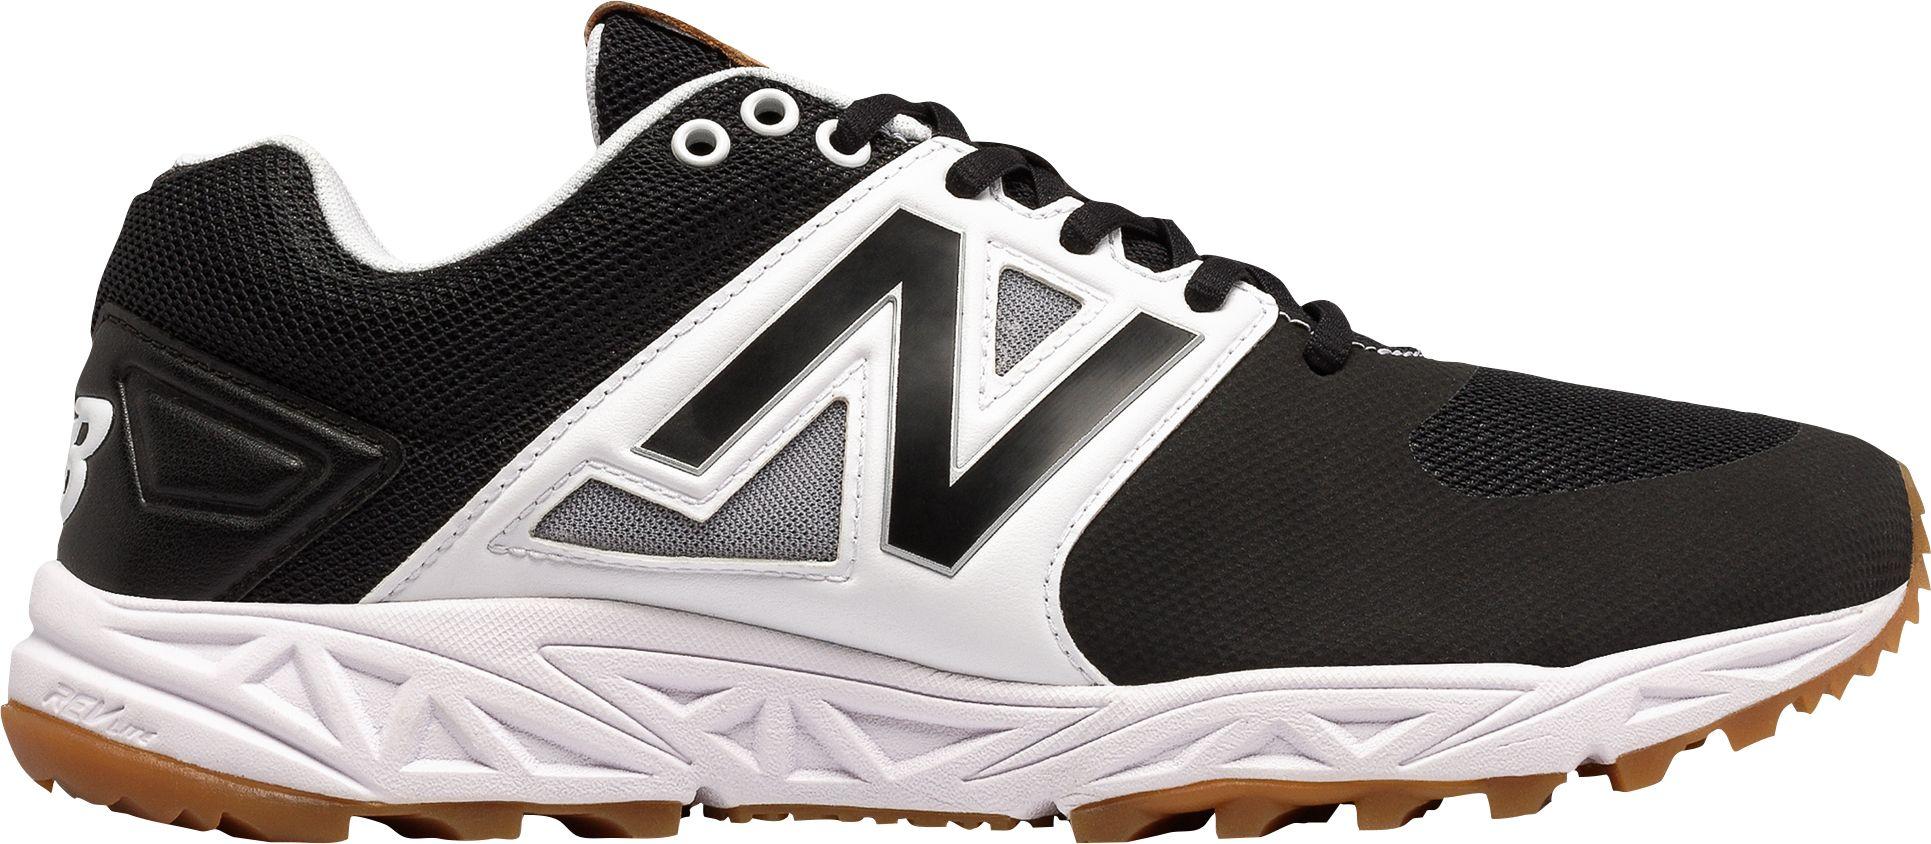 New Balance Men's 3000v3 Baseball Turf Shoes, Royal/White, 45 EU